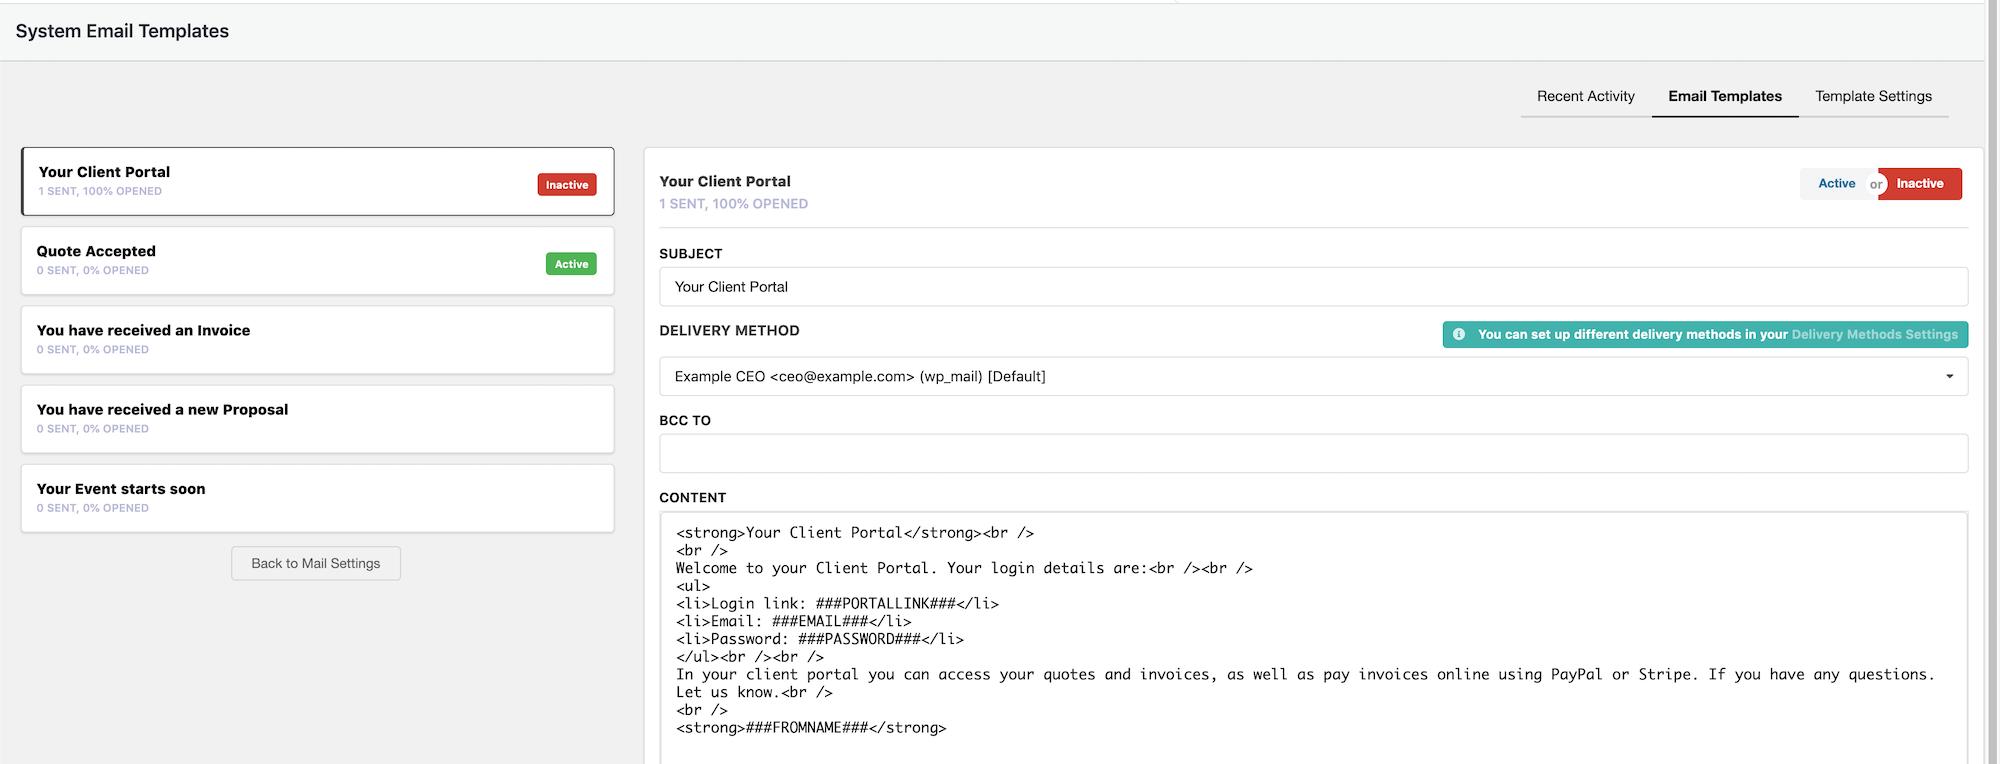 System Emails